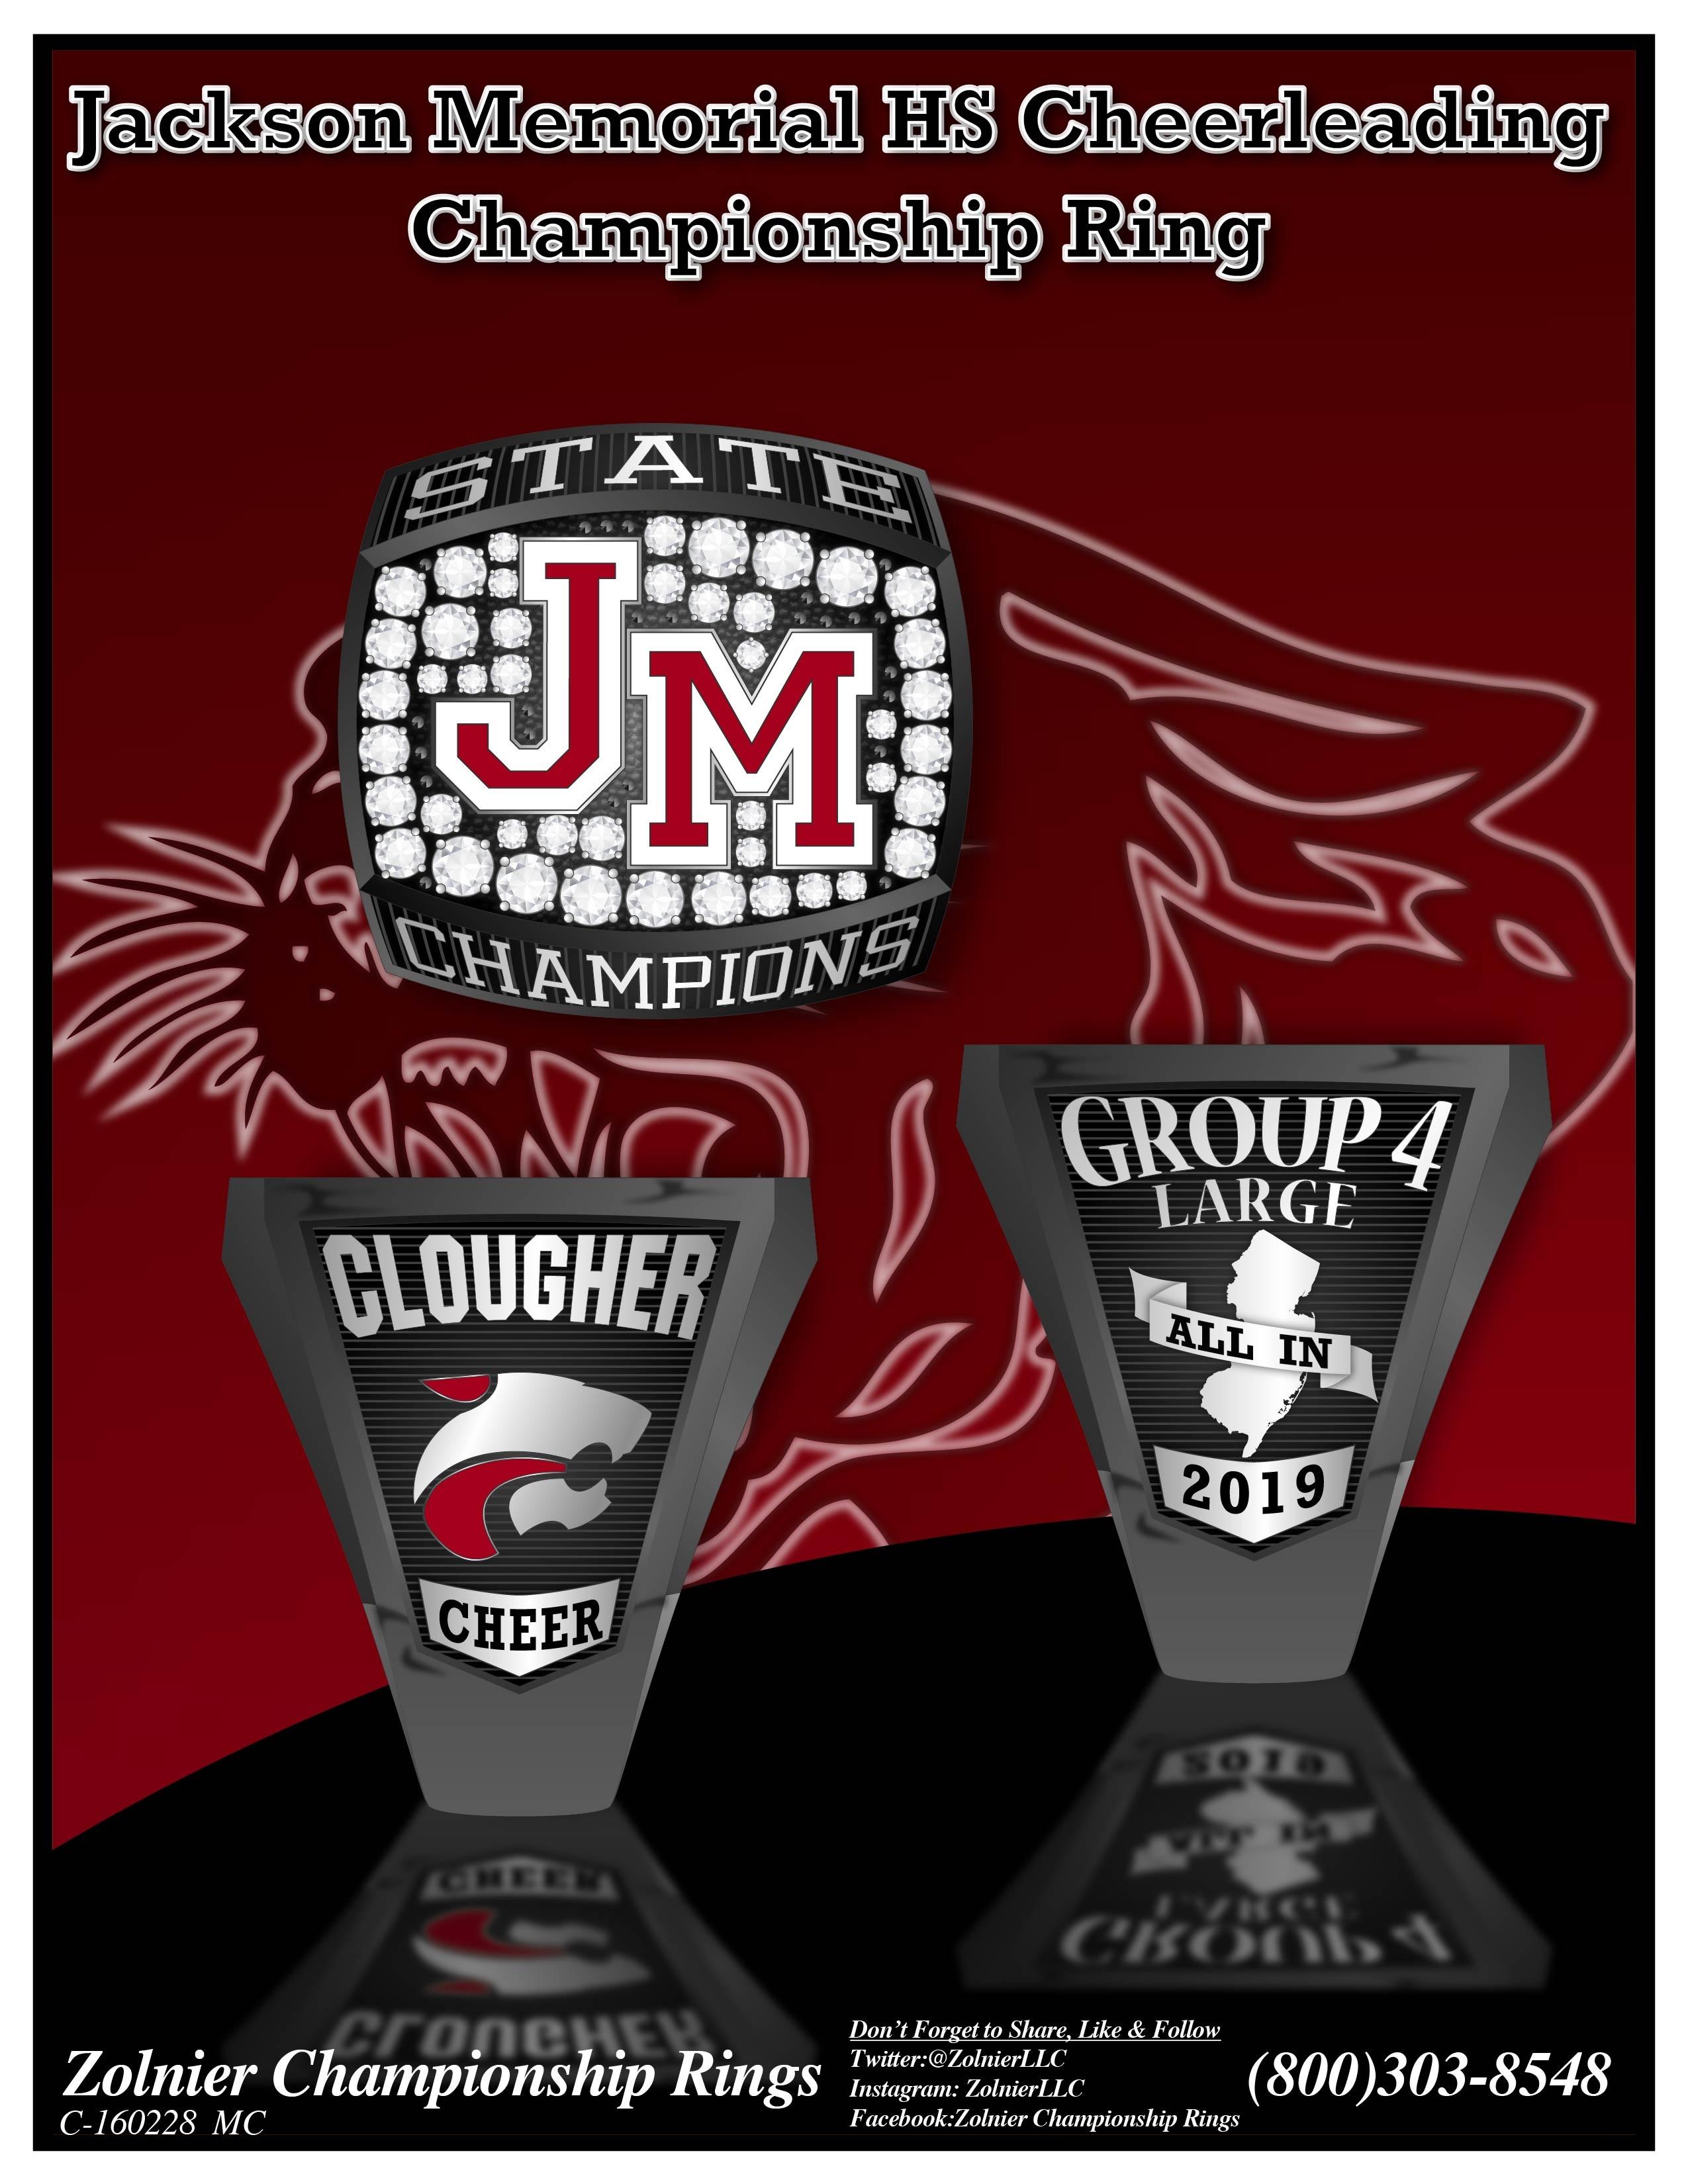 C-160228 Jackson Memorial Cheer Champ Ring